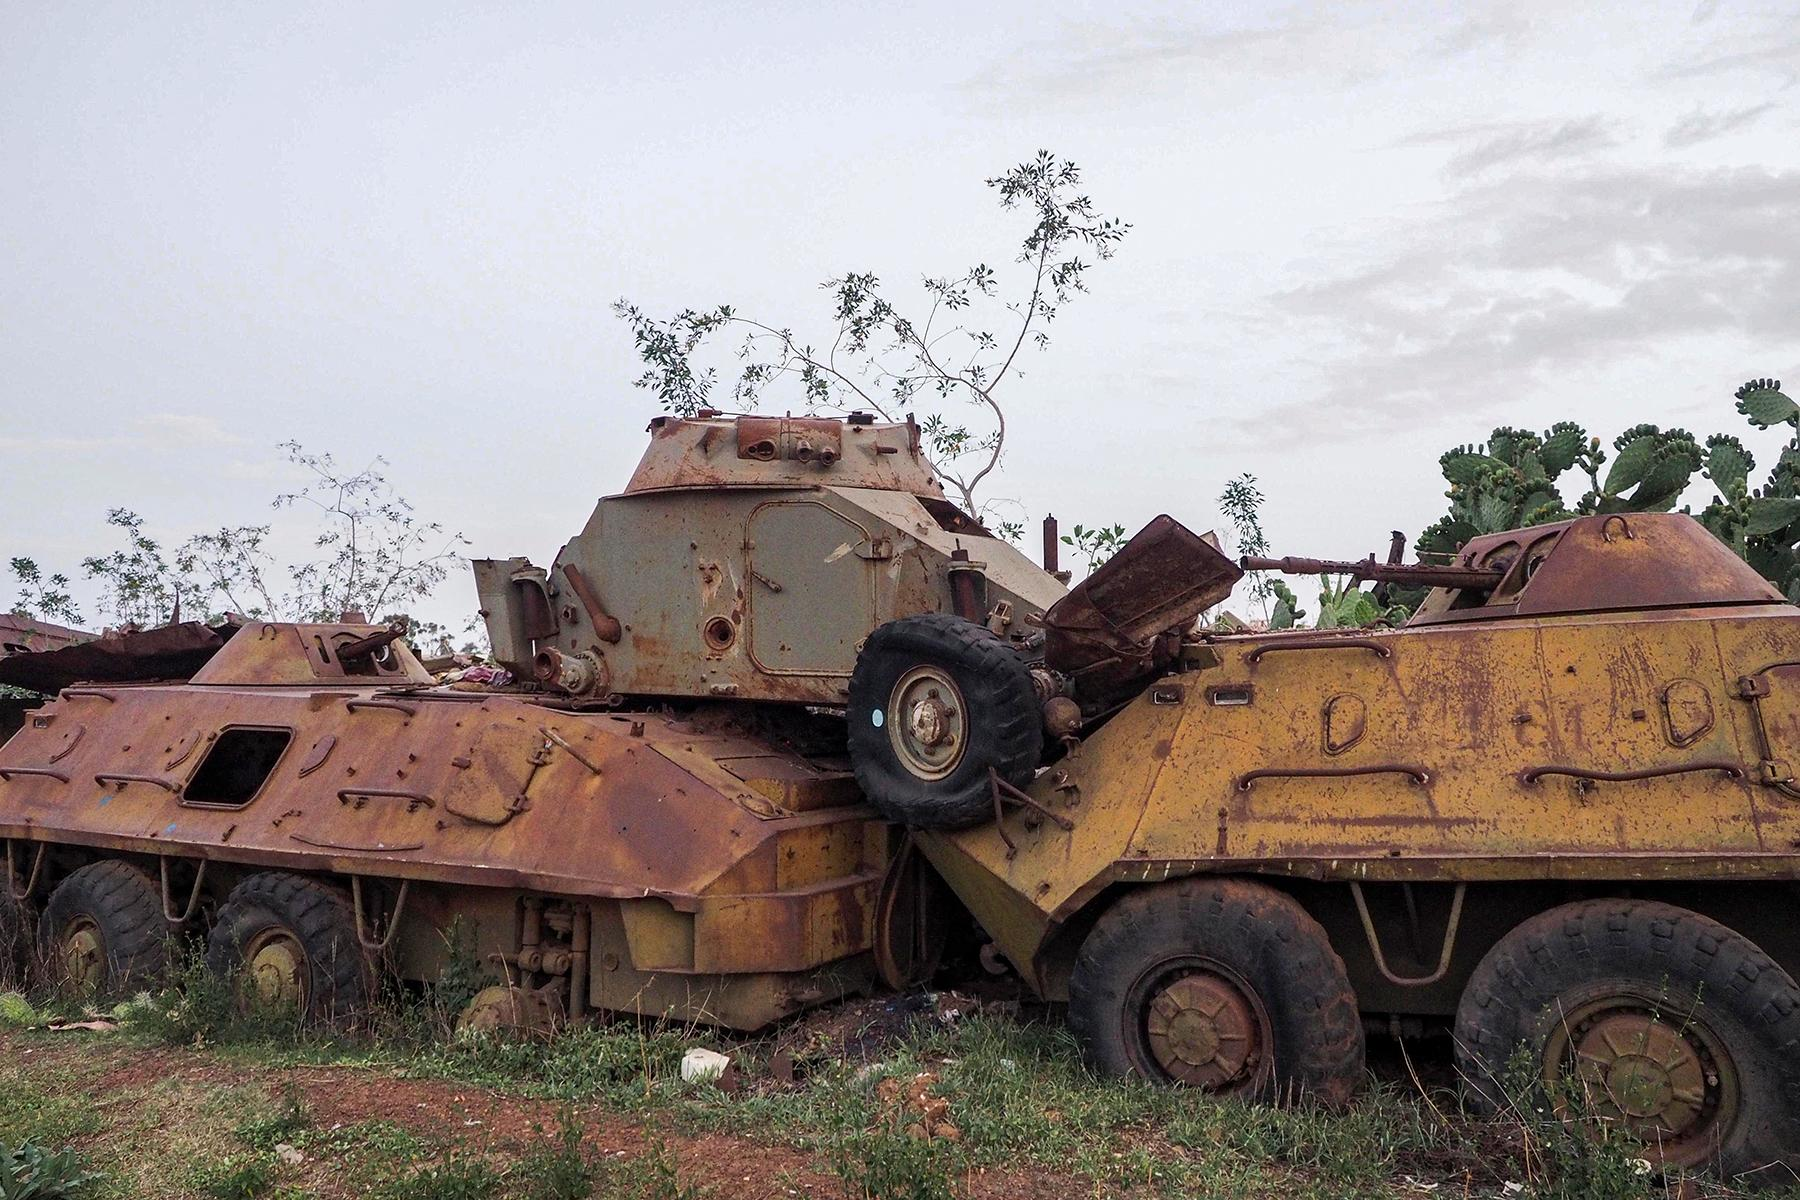 08_AsmaraHermitKingdom__MilitaryTankGraveyard_8.) Wiki_Tank_Graveyard__Asmara,_Eritrea_(30479695820)_CC BY-SA 2.0